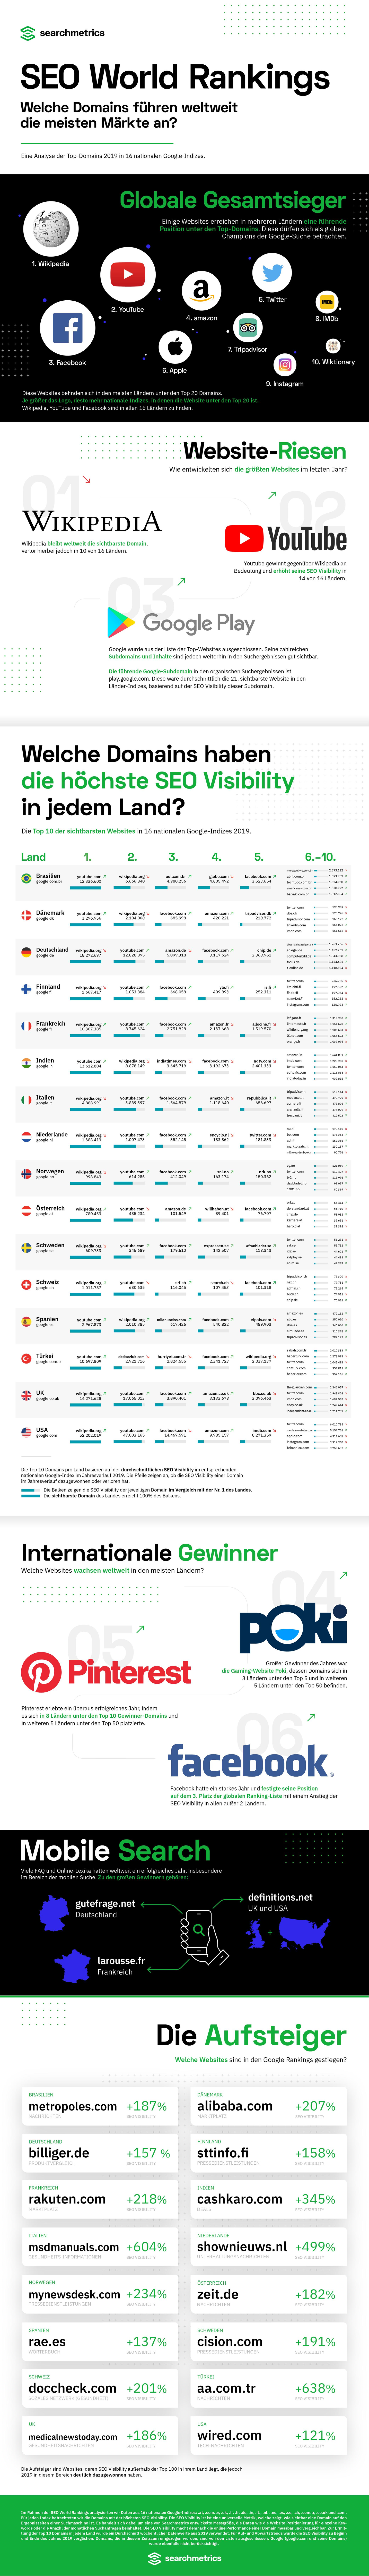 Searchmetrics-SEO-World-Rankings-2020-DE